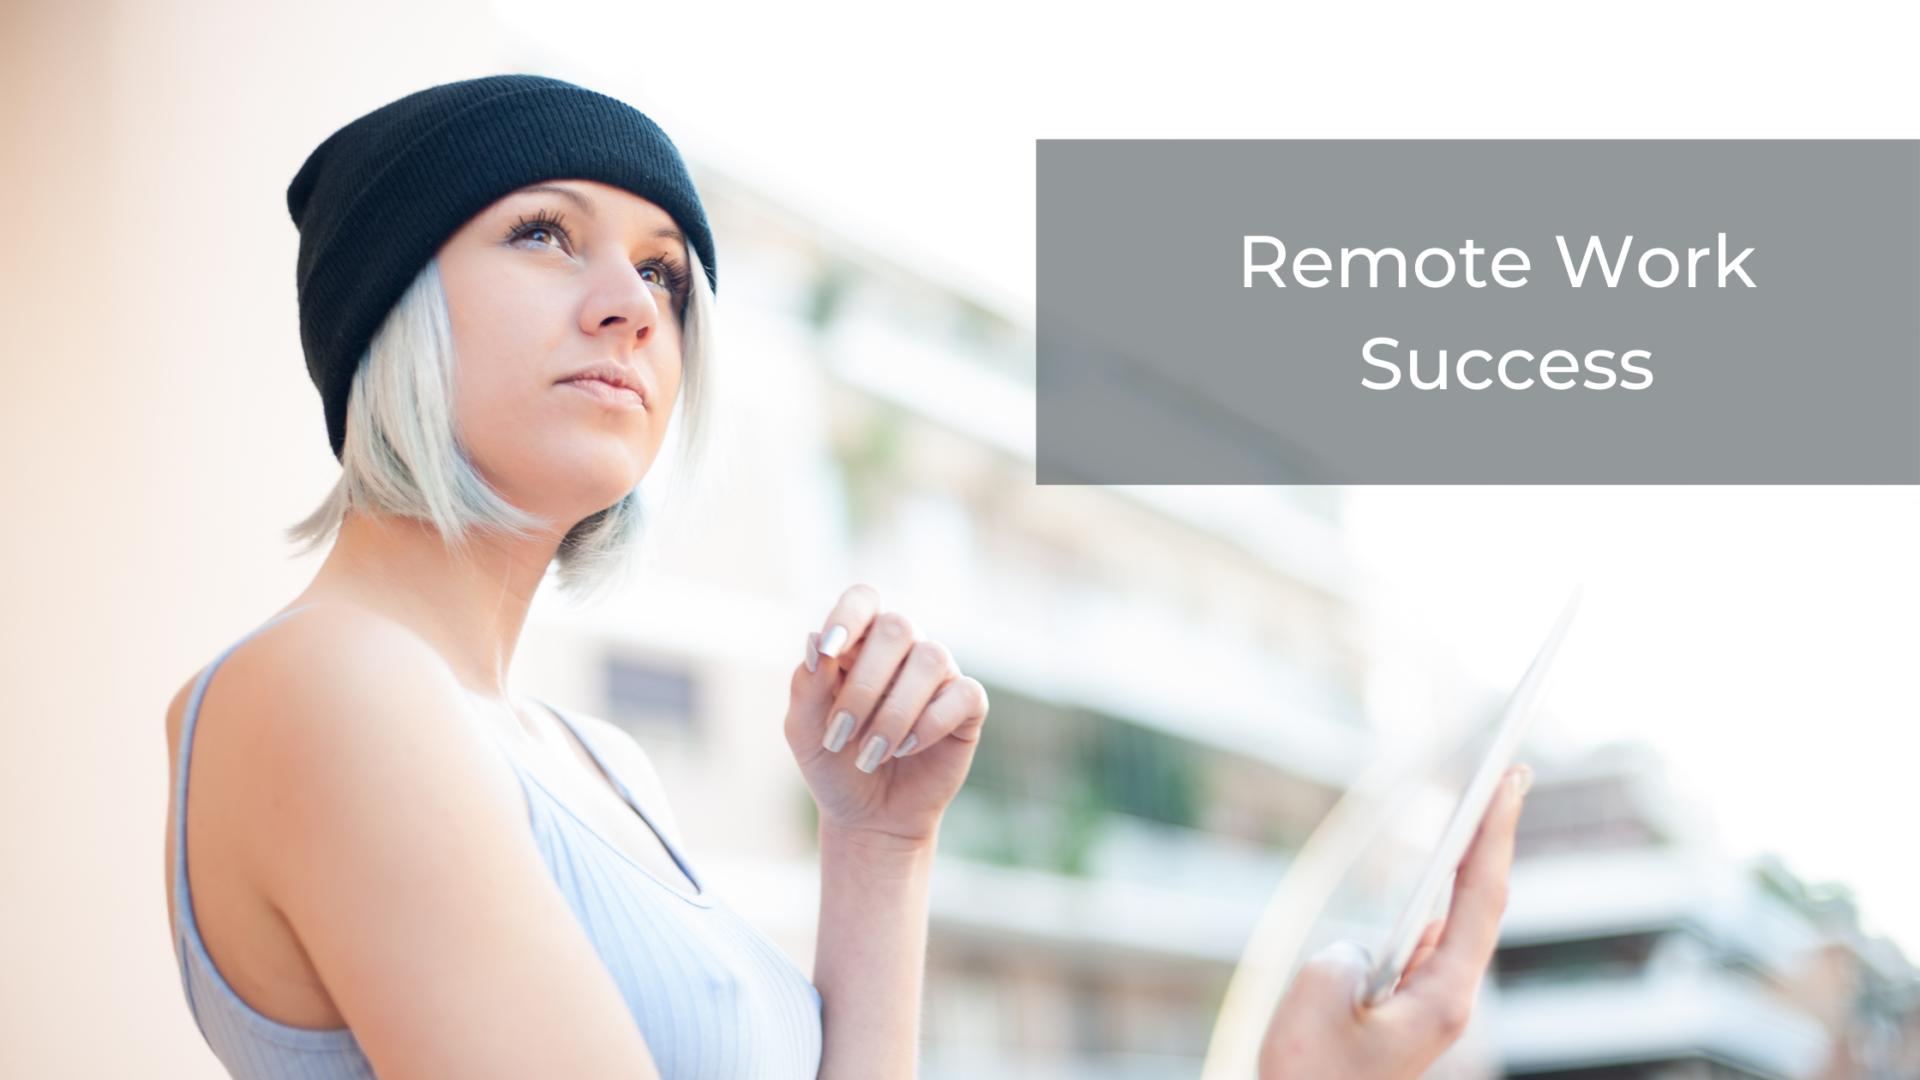 Remote work success